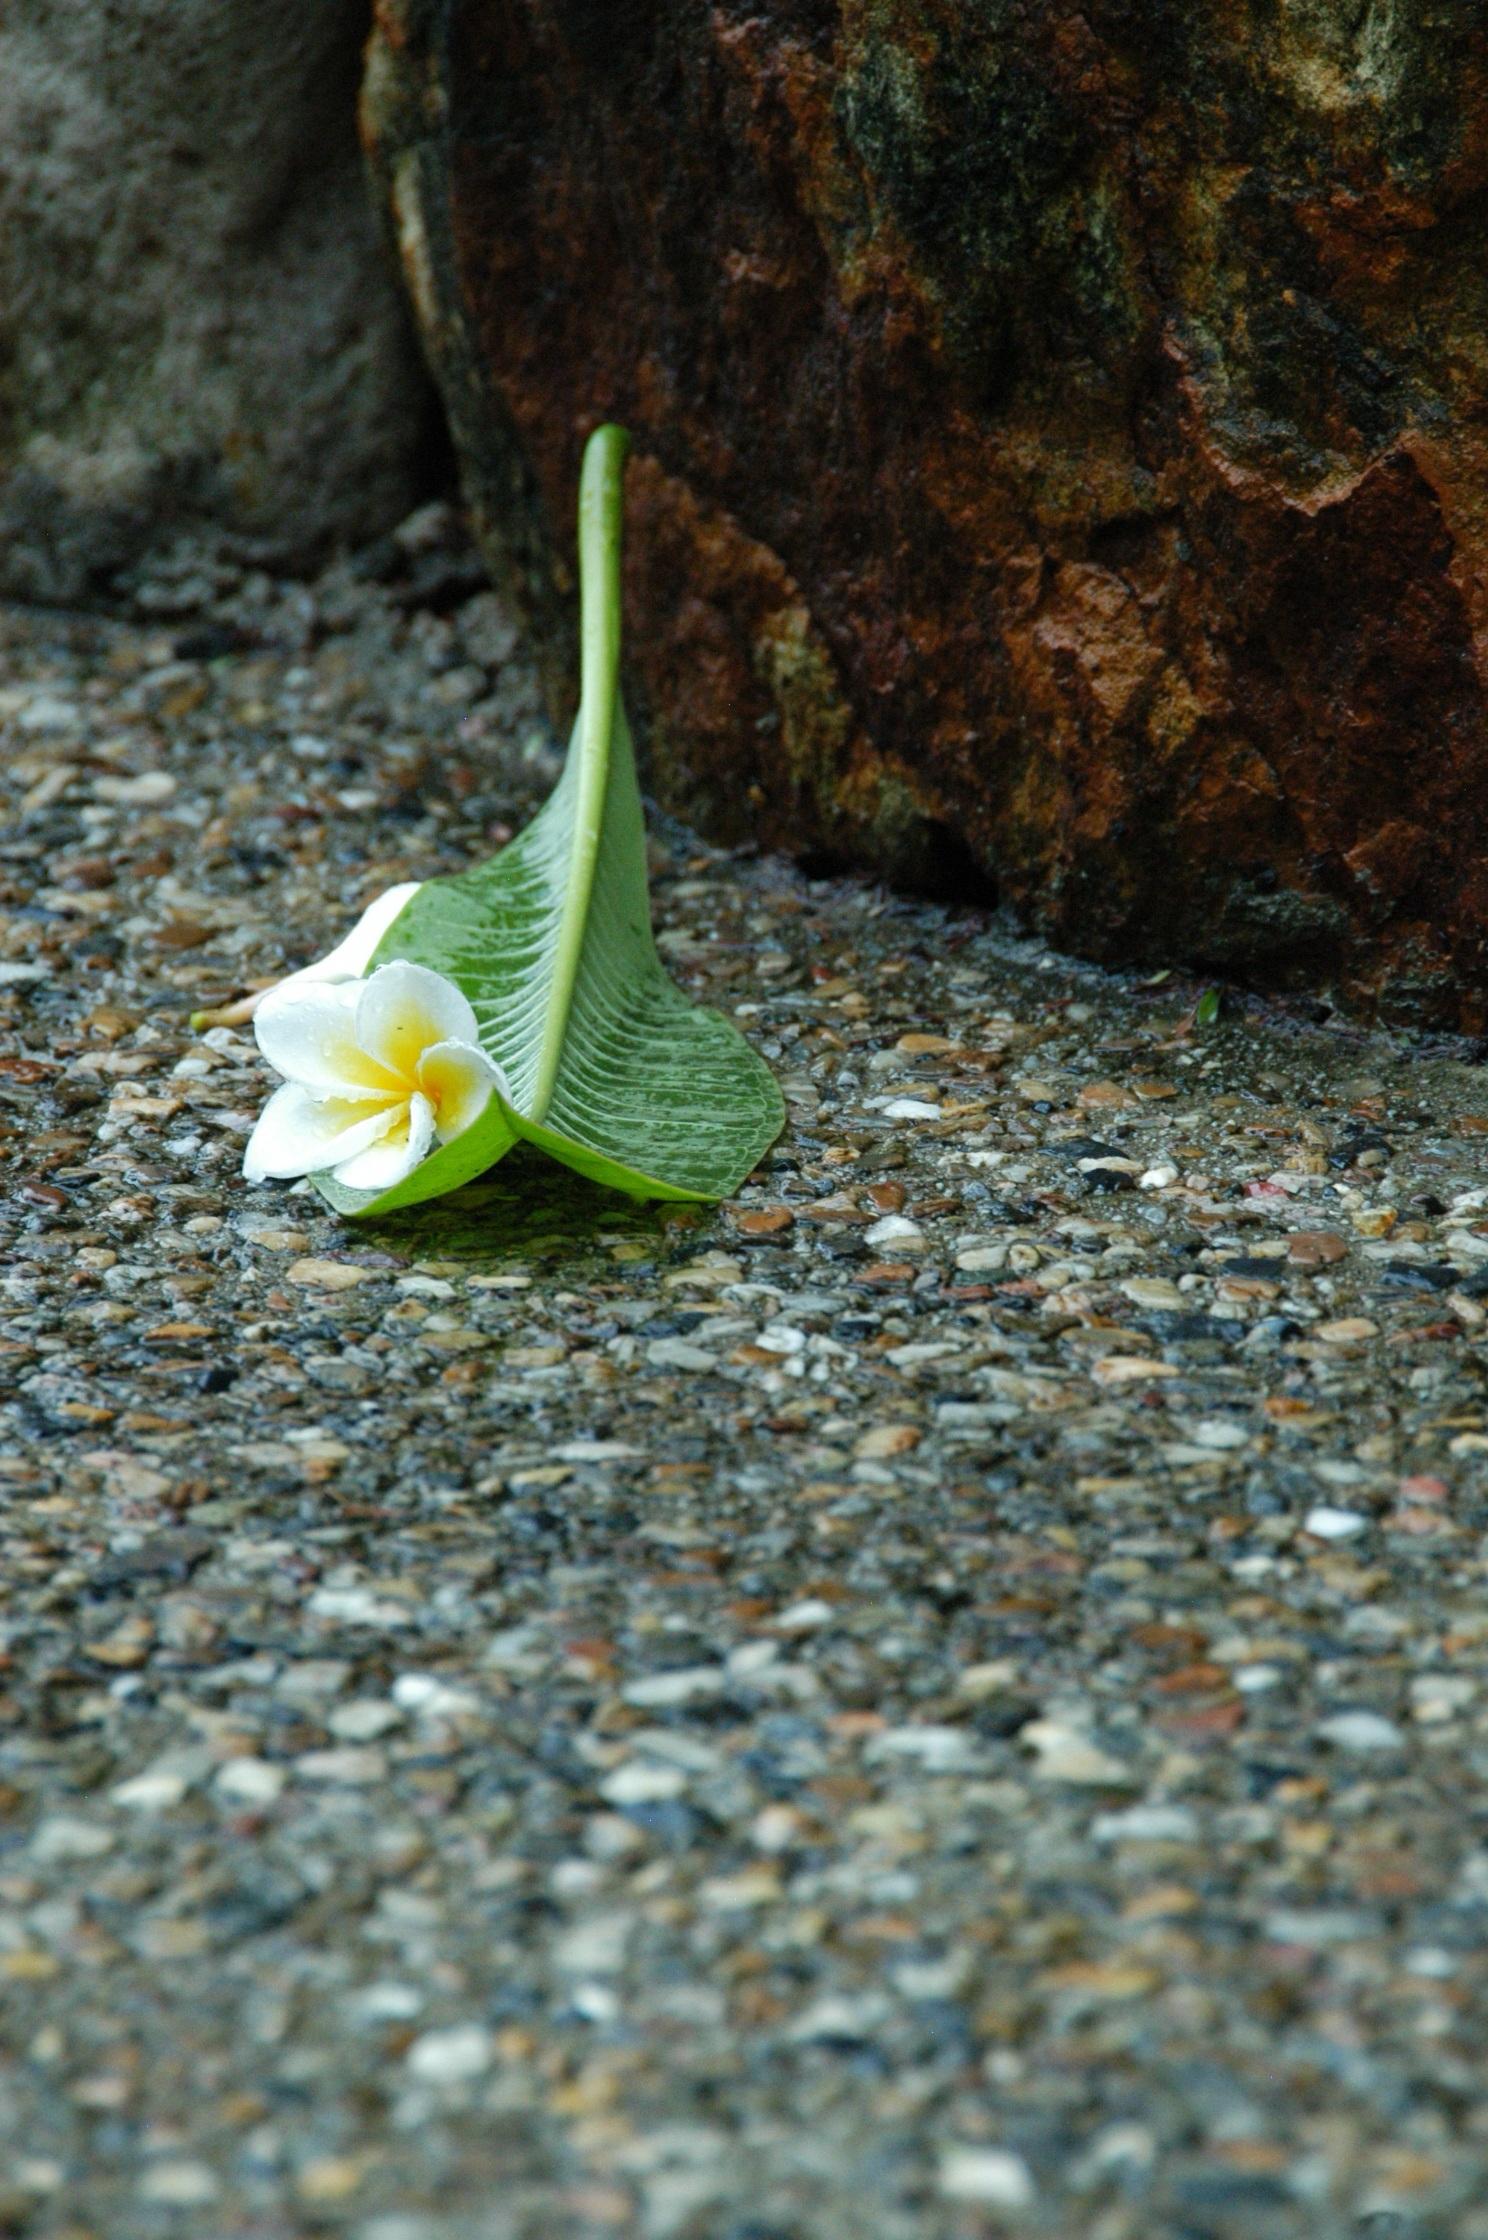 naturaleza csped planta calle lluvia hoja acera flor mojado piedra pavimento fauna silvestre patrn verde guijarro